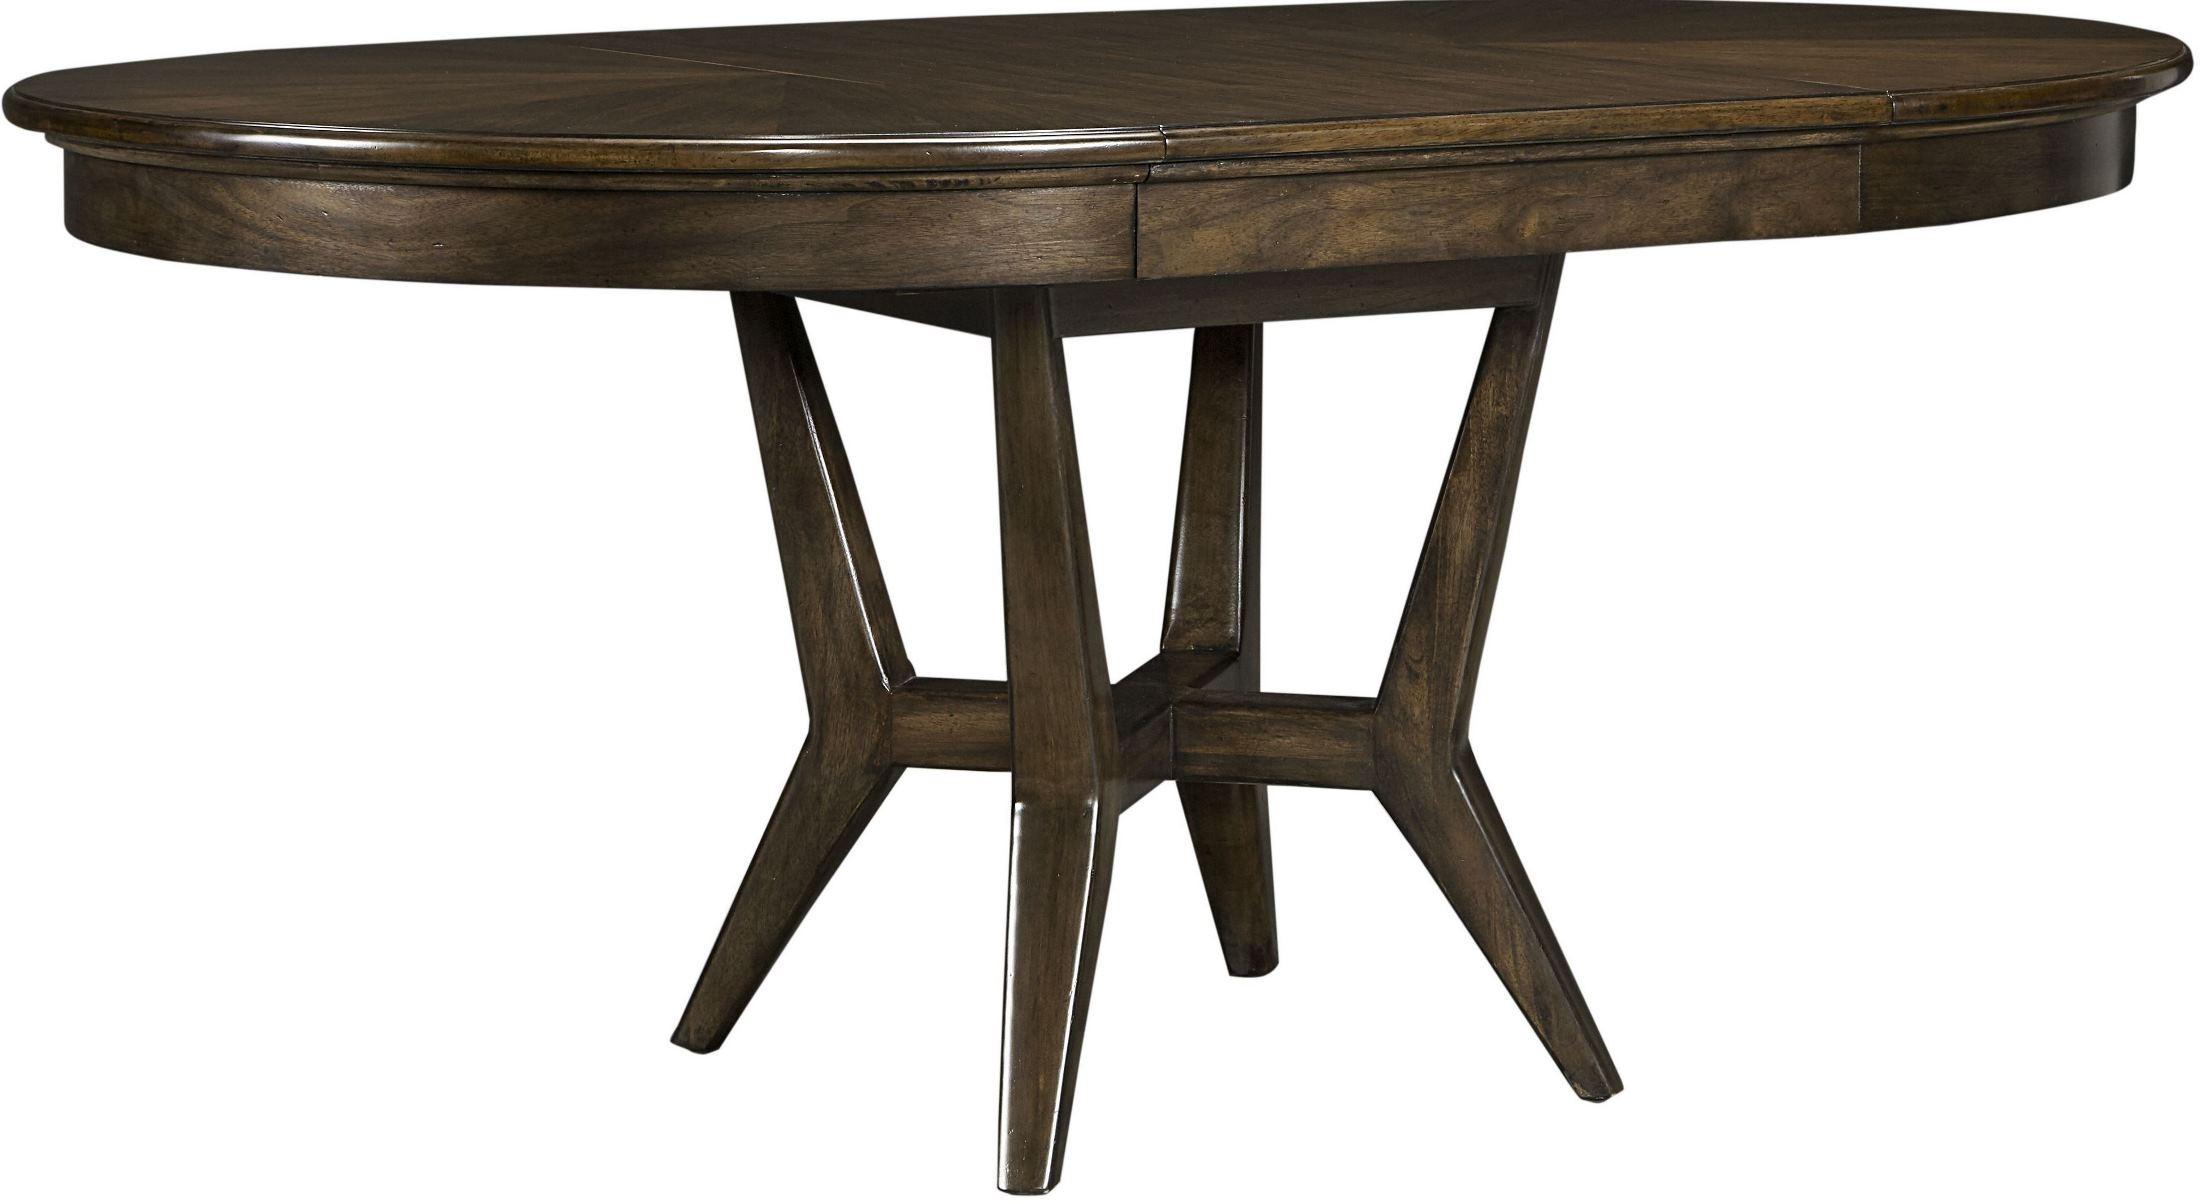 Santa Clara Burnished Walnut Extendable Round Dining Table  : 58511303qsiloalt1 from colemanfurniture.com size 2200 x 1204 jpeg 209kB